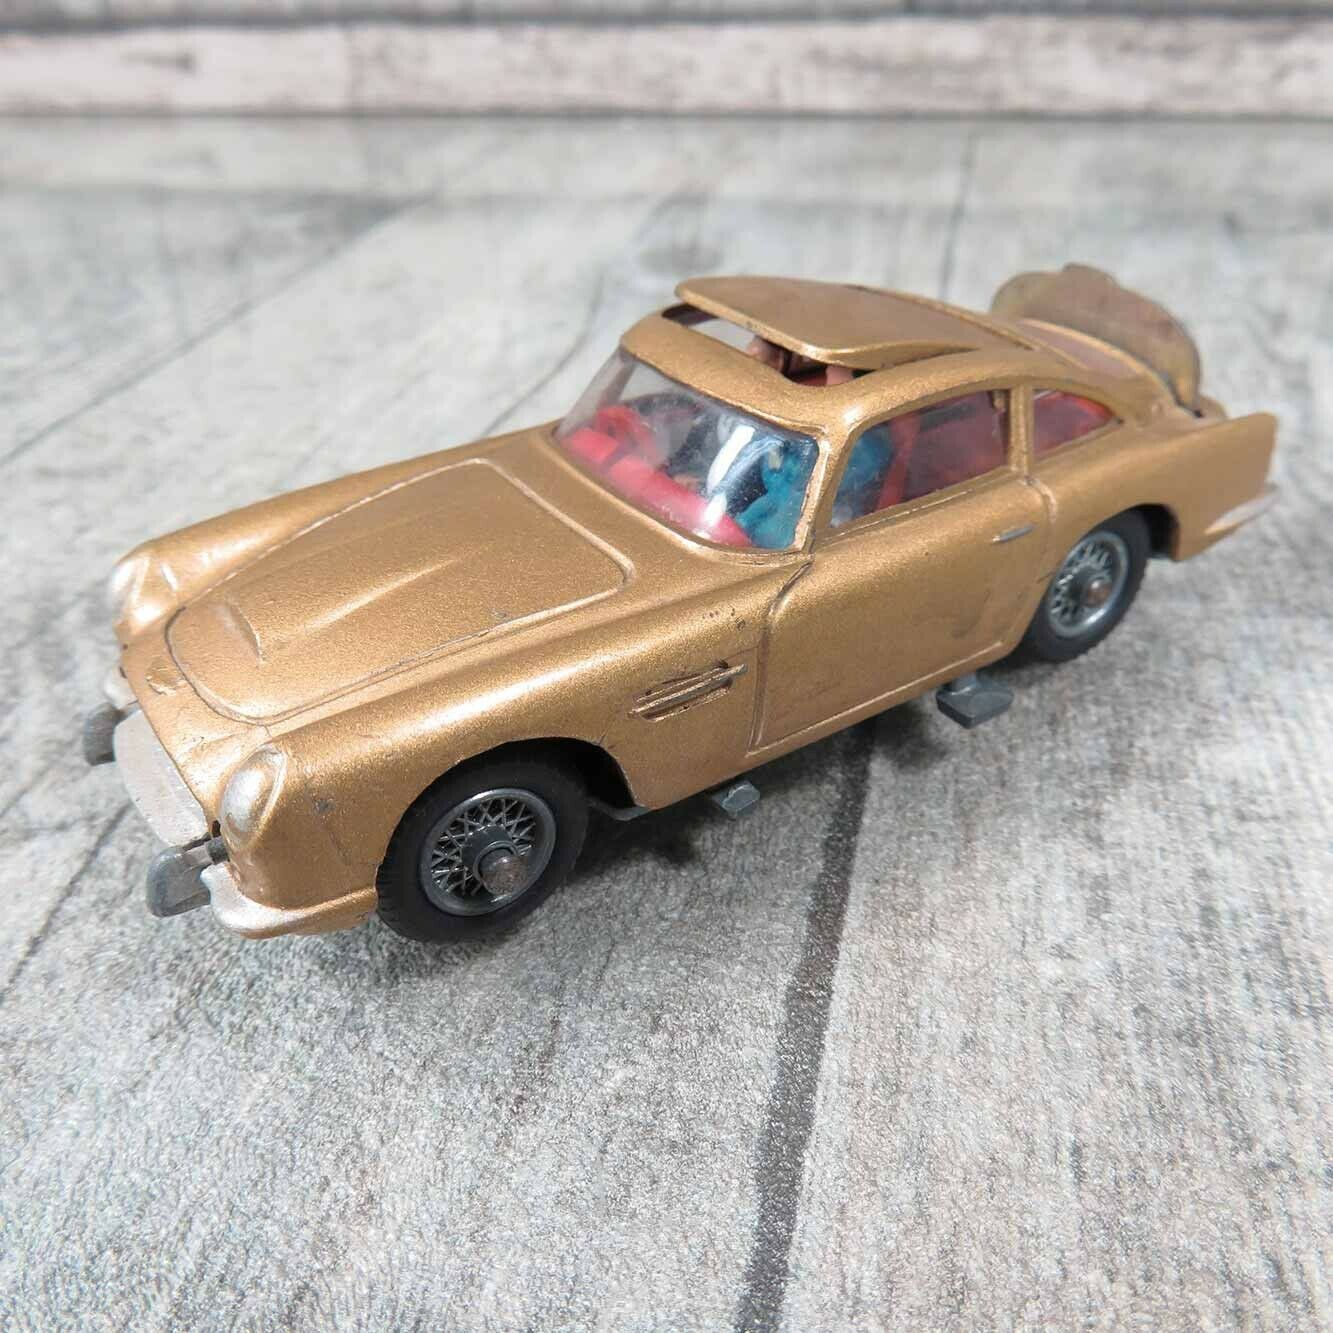 CORGI Toys 261 - 1 43 - James Bond Aston Martin DB5 - Q20613